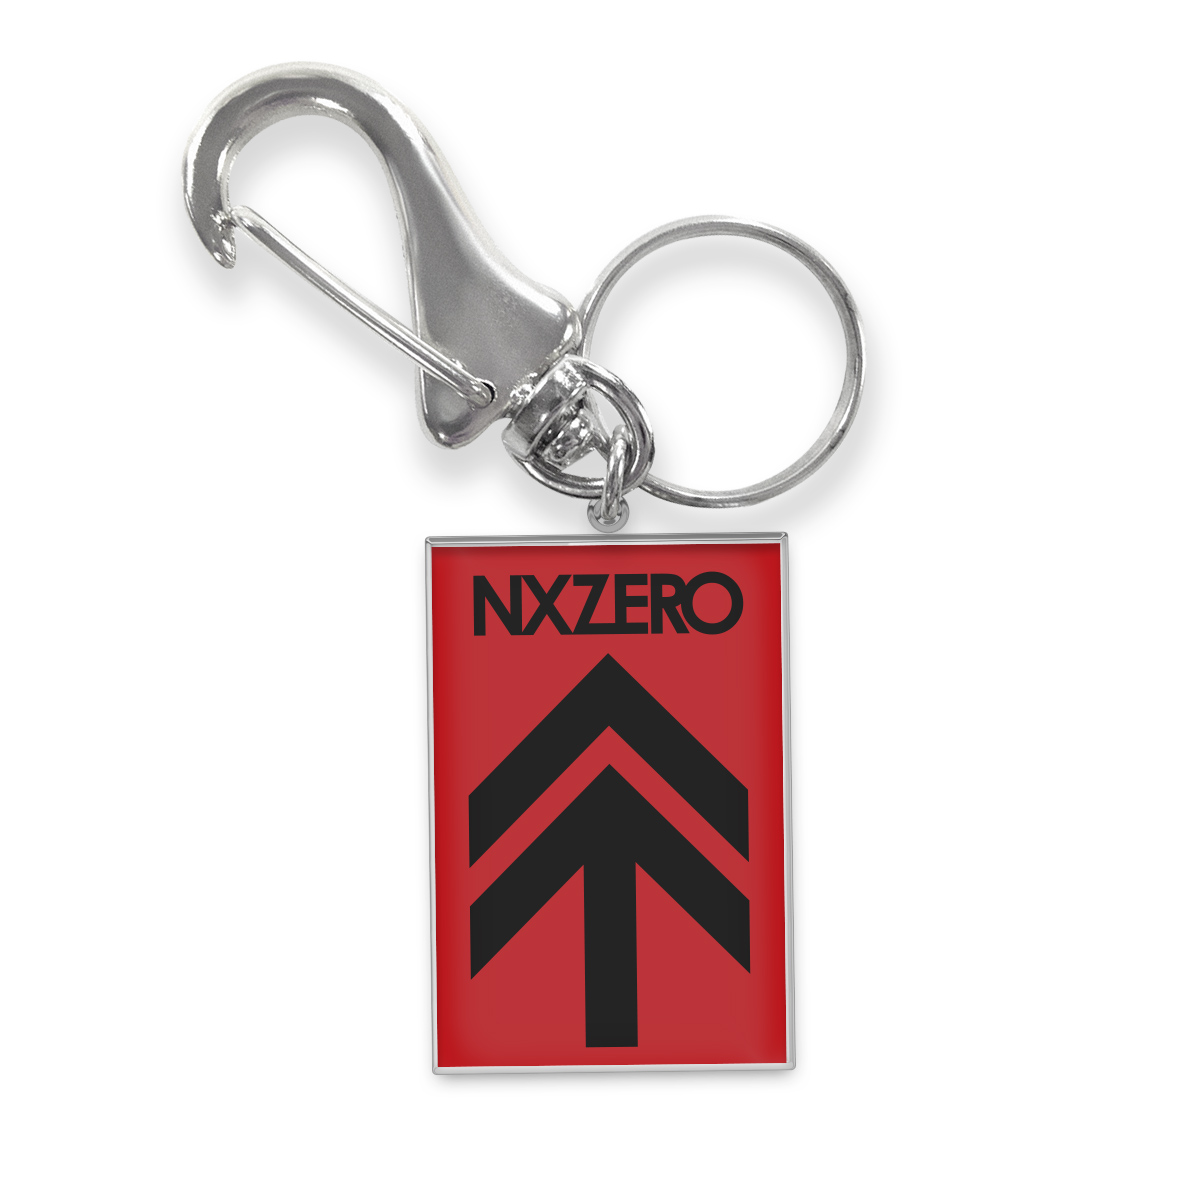 Chaveiro de Metal NXZero Norte